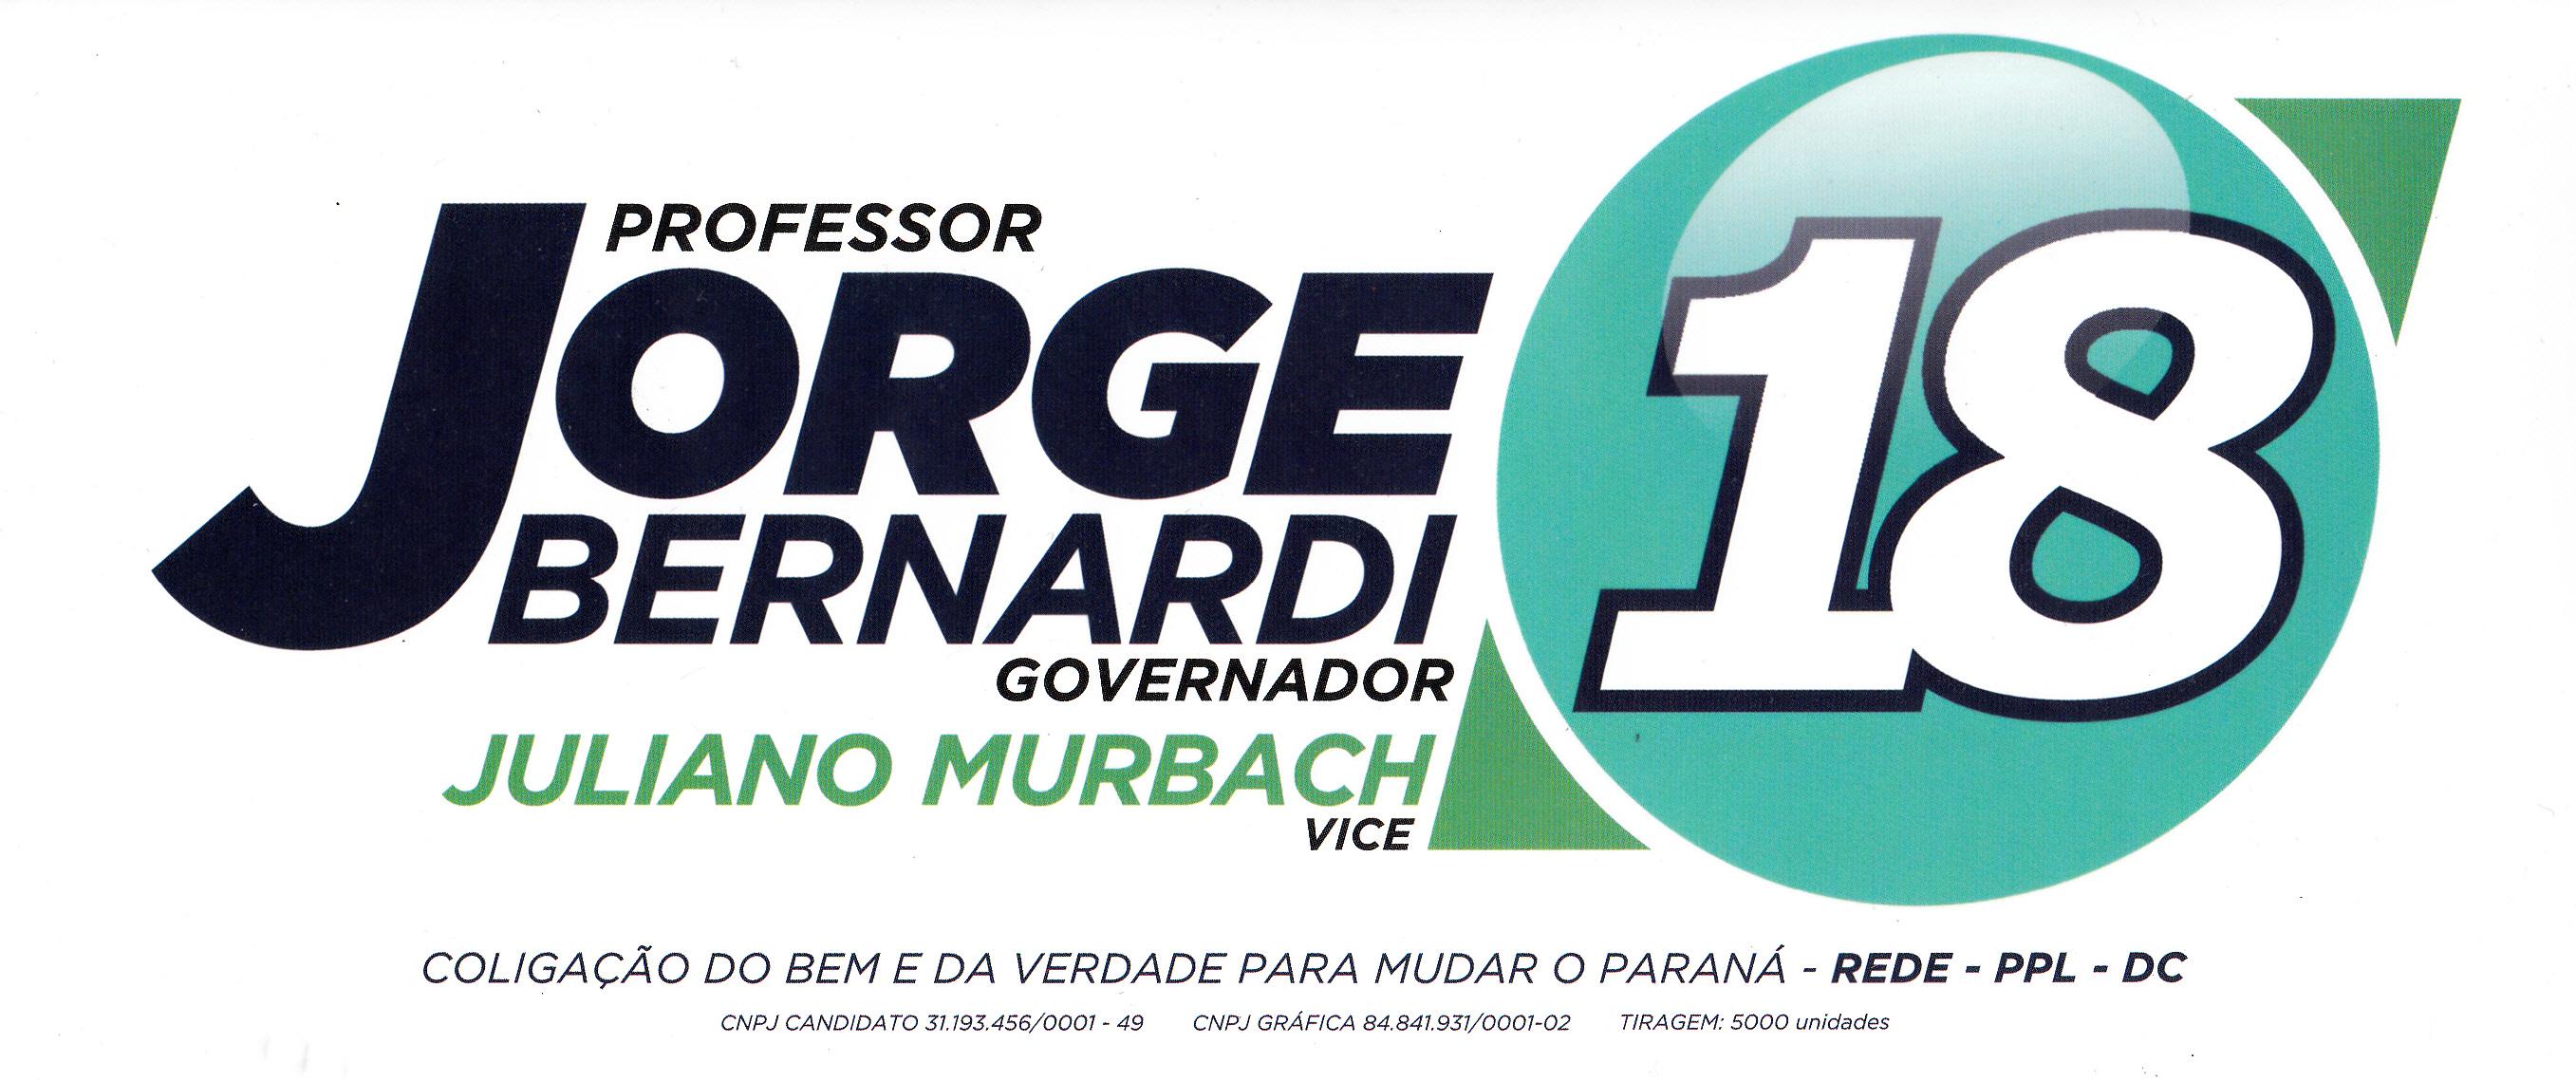 REDE_2018_Jorge Bernardi